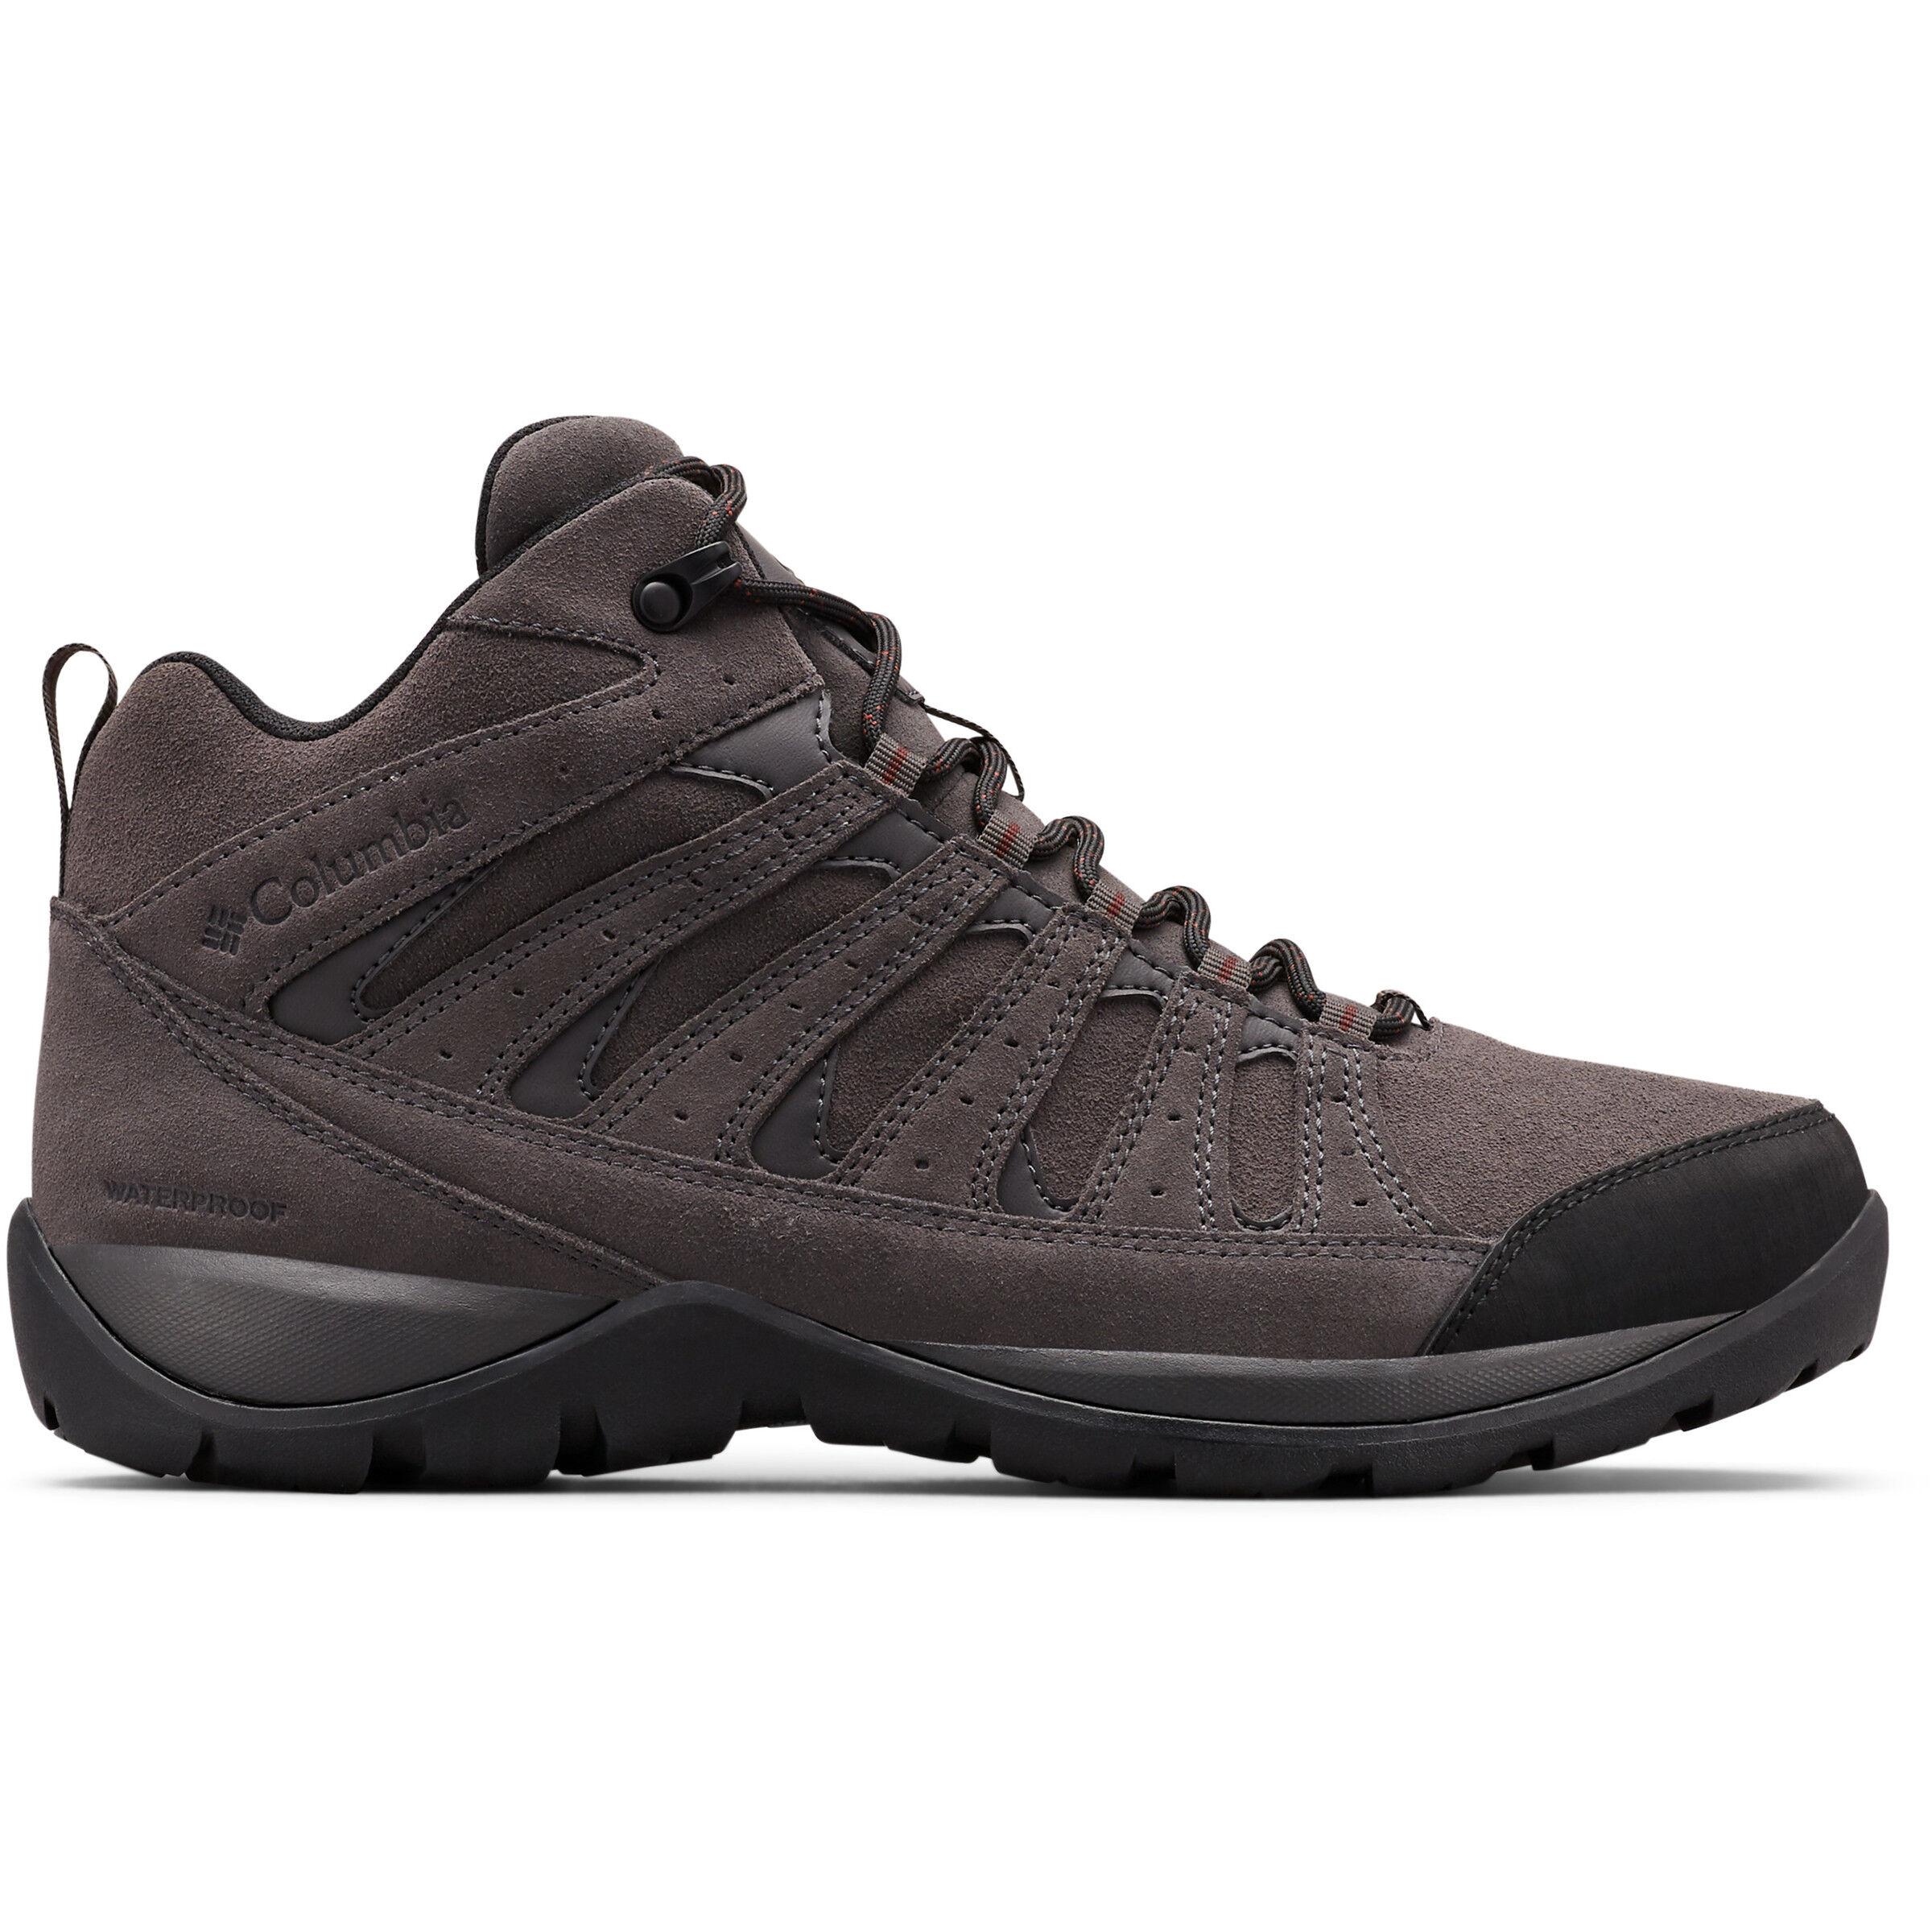 Columbia Redmond V2 LTR WP Mid Cut Schuhe Herren dark greymadder brown